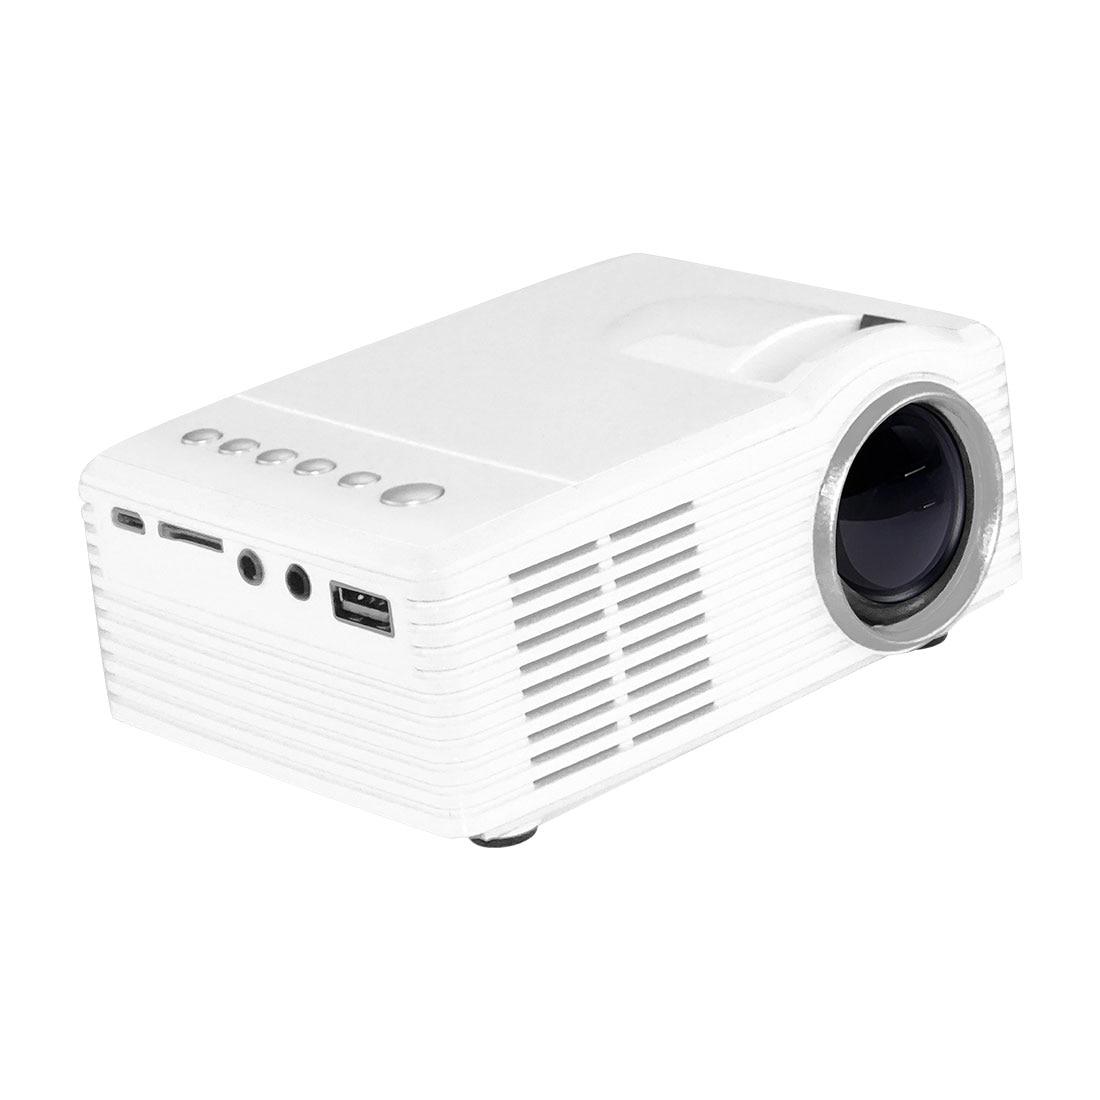 centechia White MG300 Portable LCD Projector 3.5mm Audio 320x240 Pixel HDMI USB Mini MG300 Projector Home Media Player EU Plug